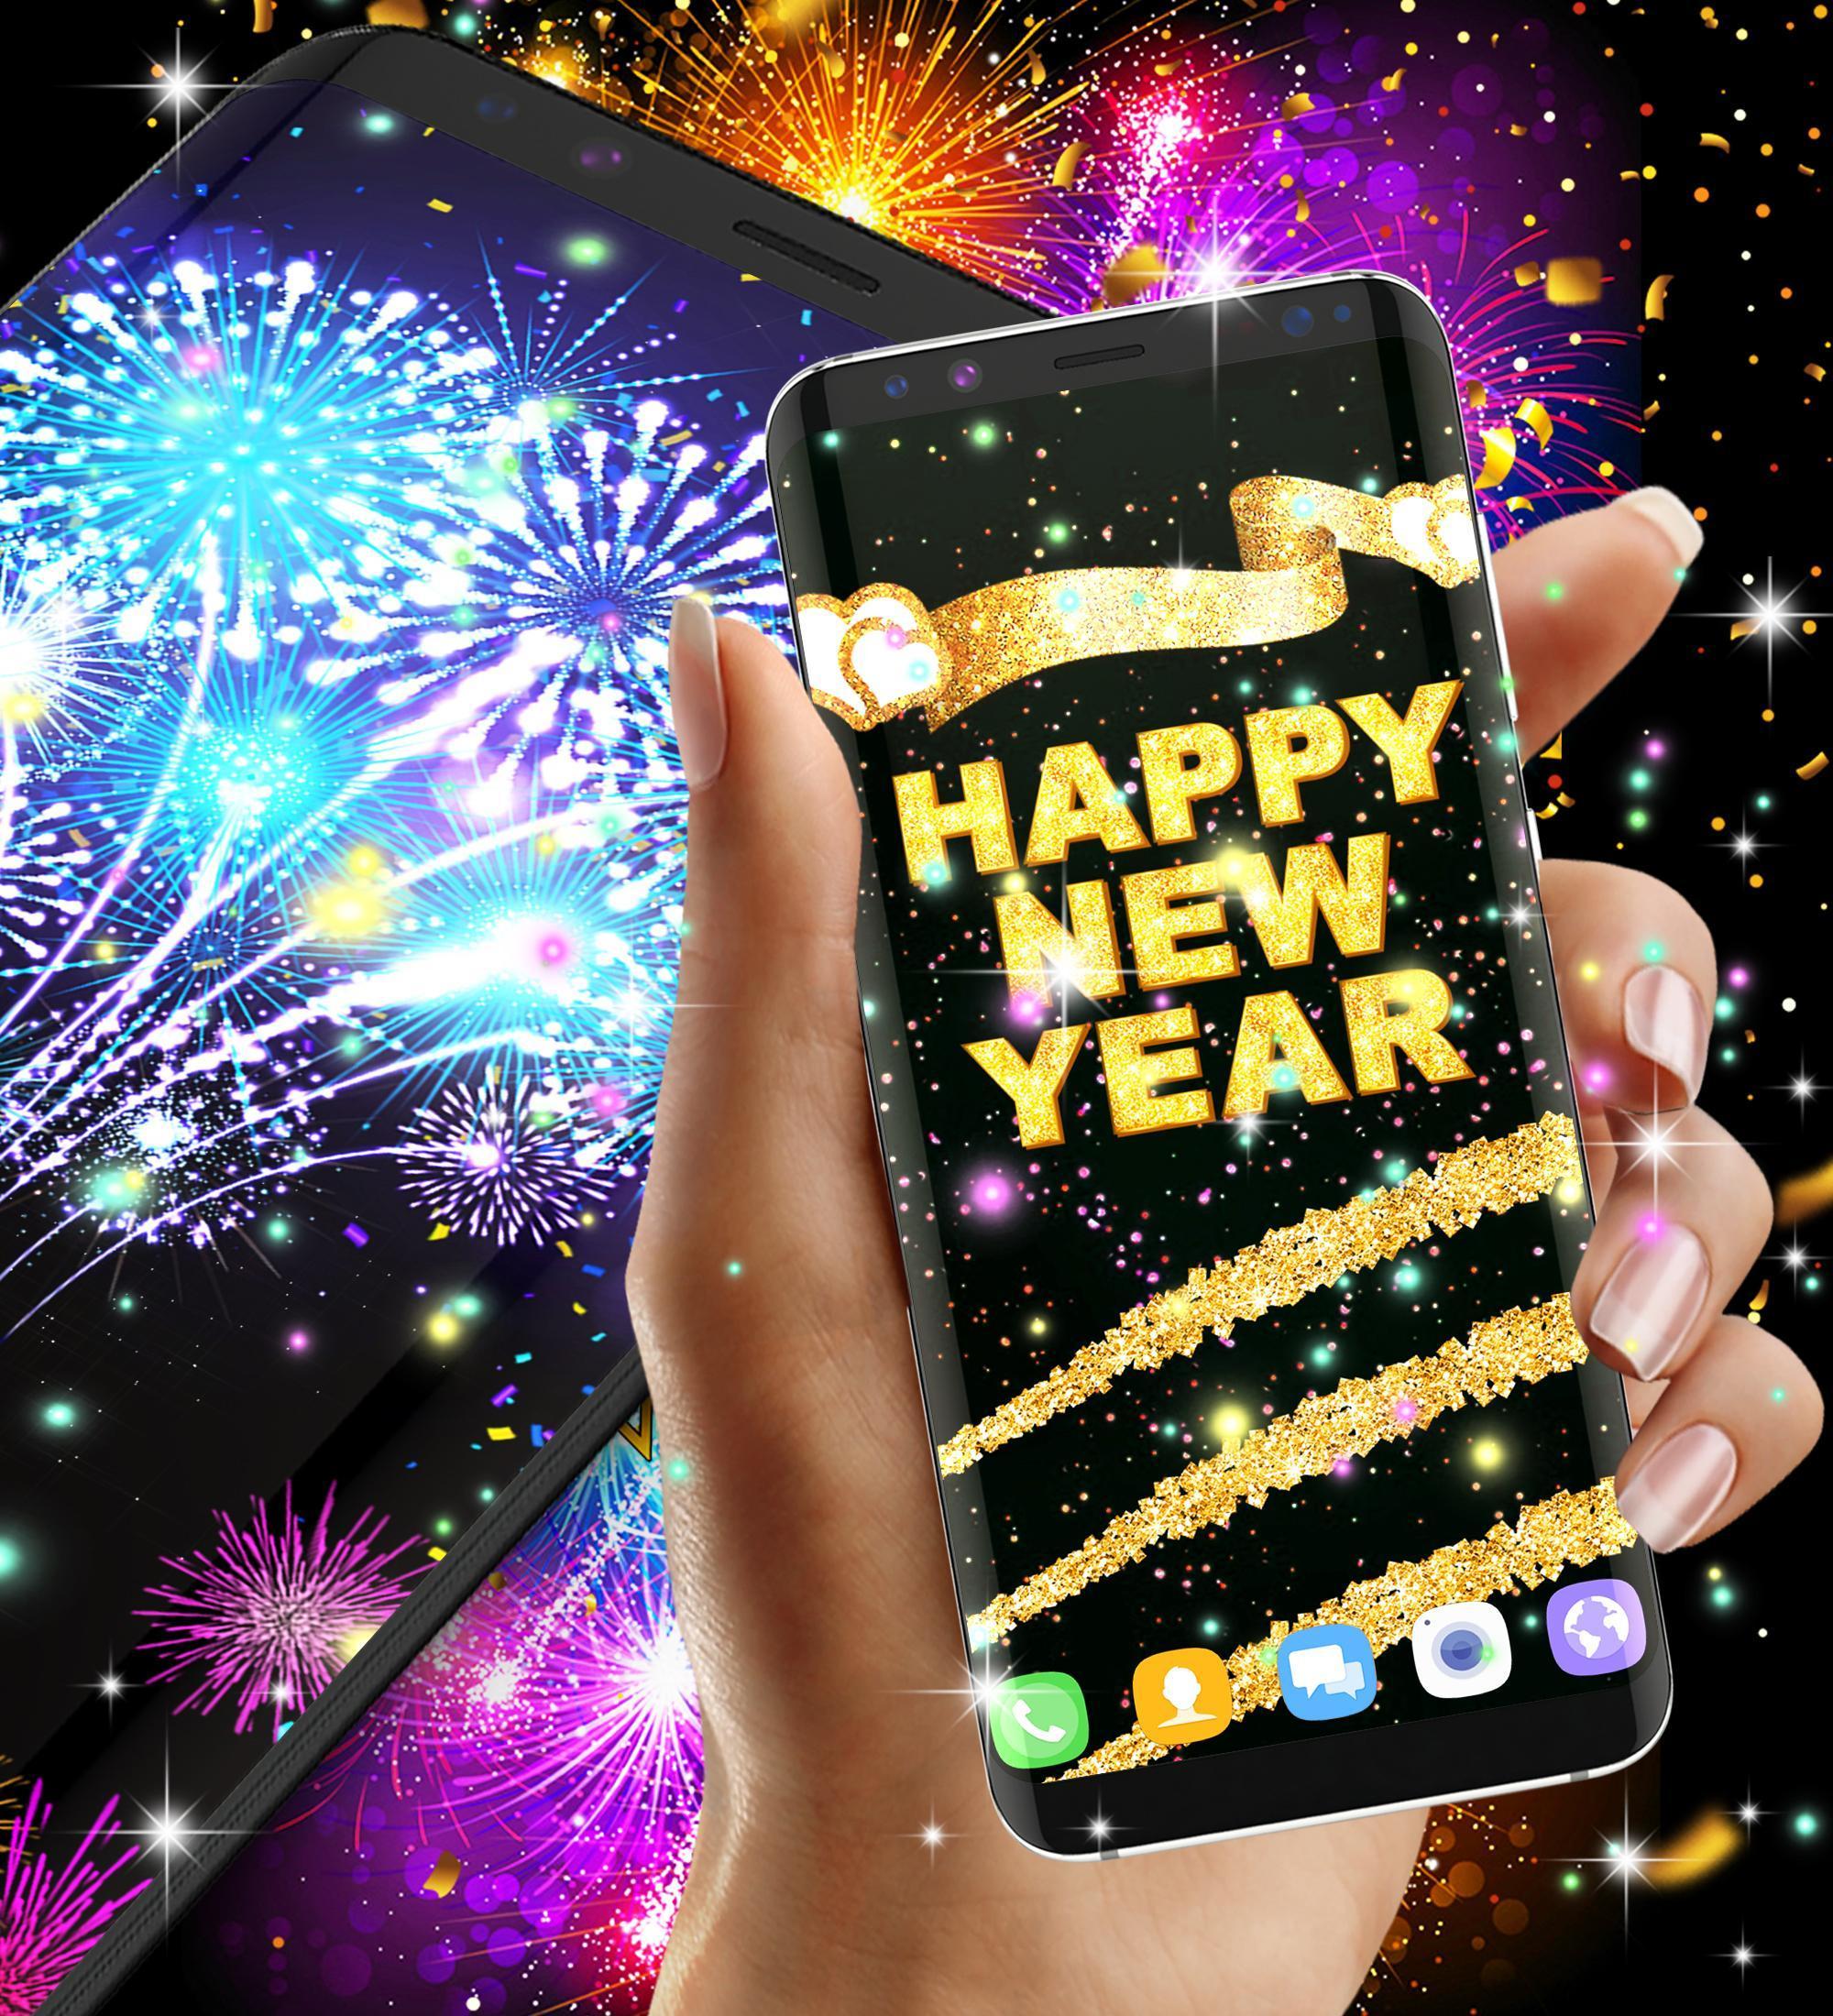 Happy New Year 2020 Live Wallpaper安卓下載 安卓版apk 免費下載